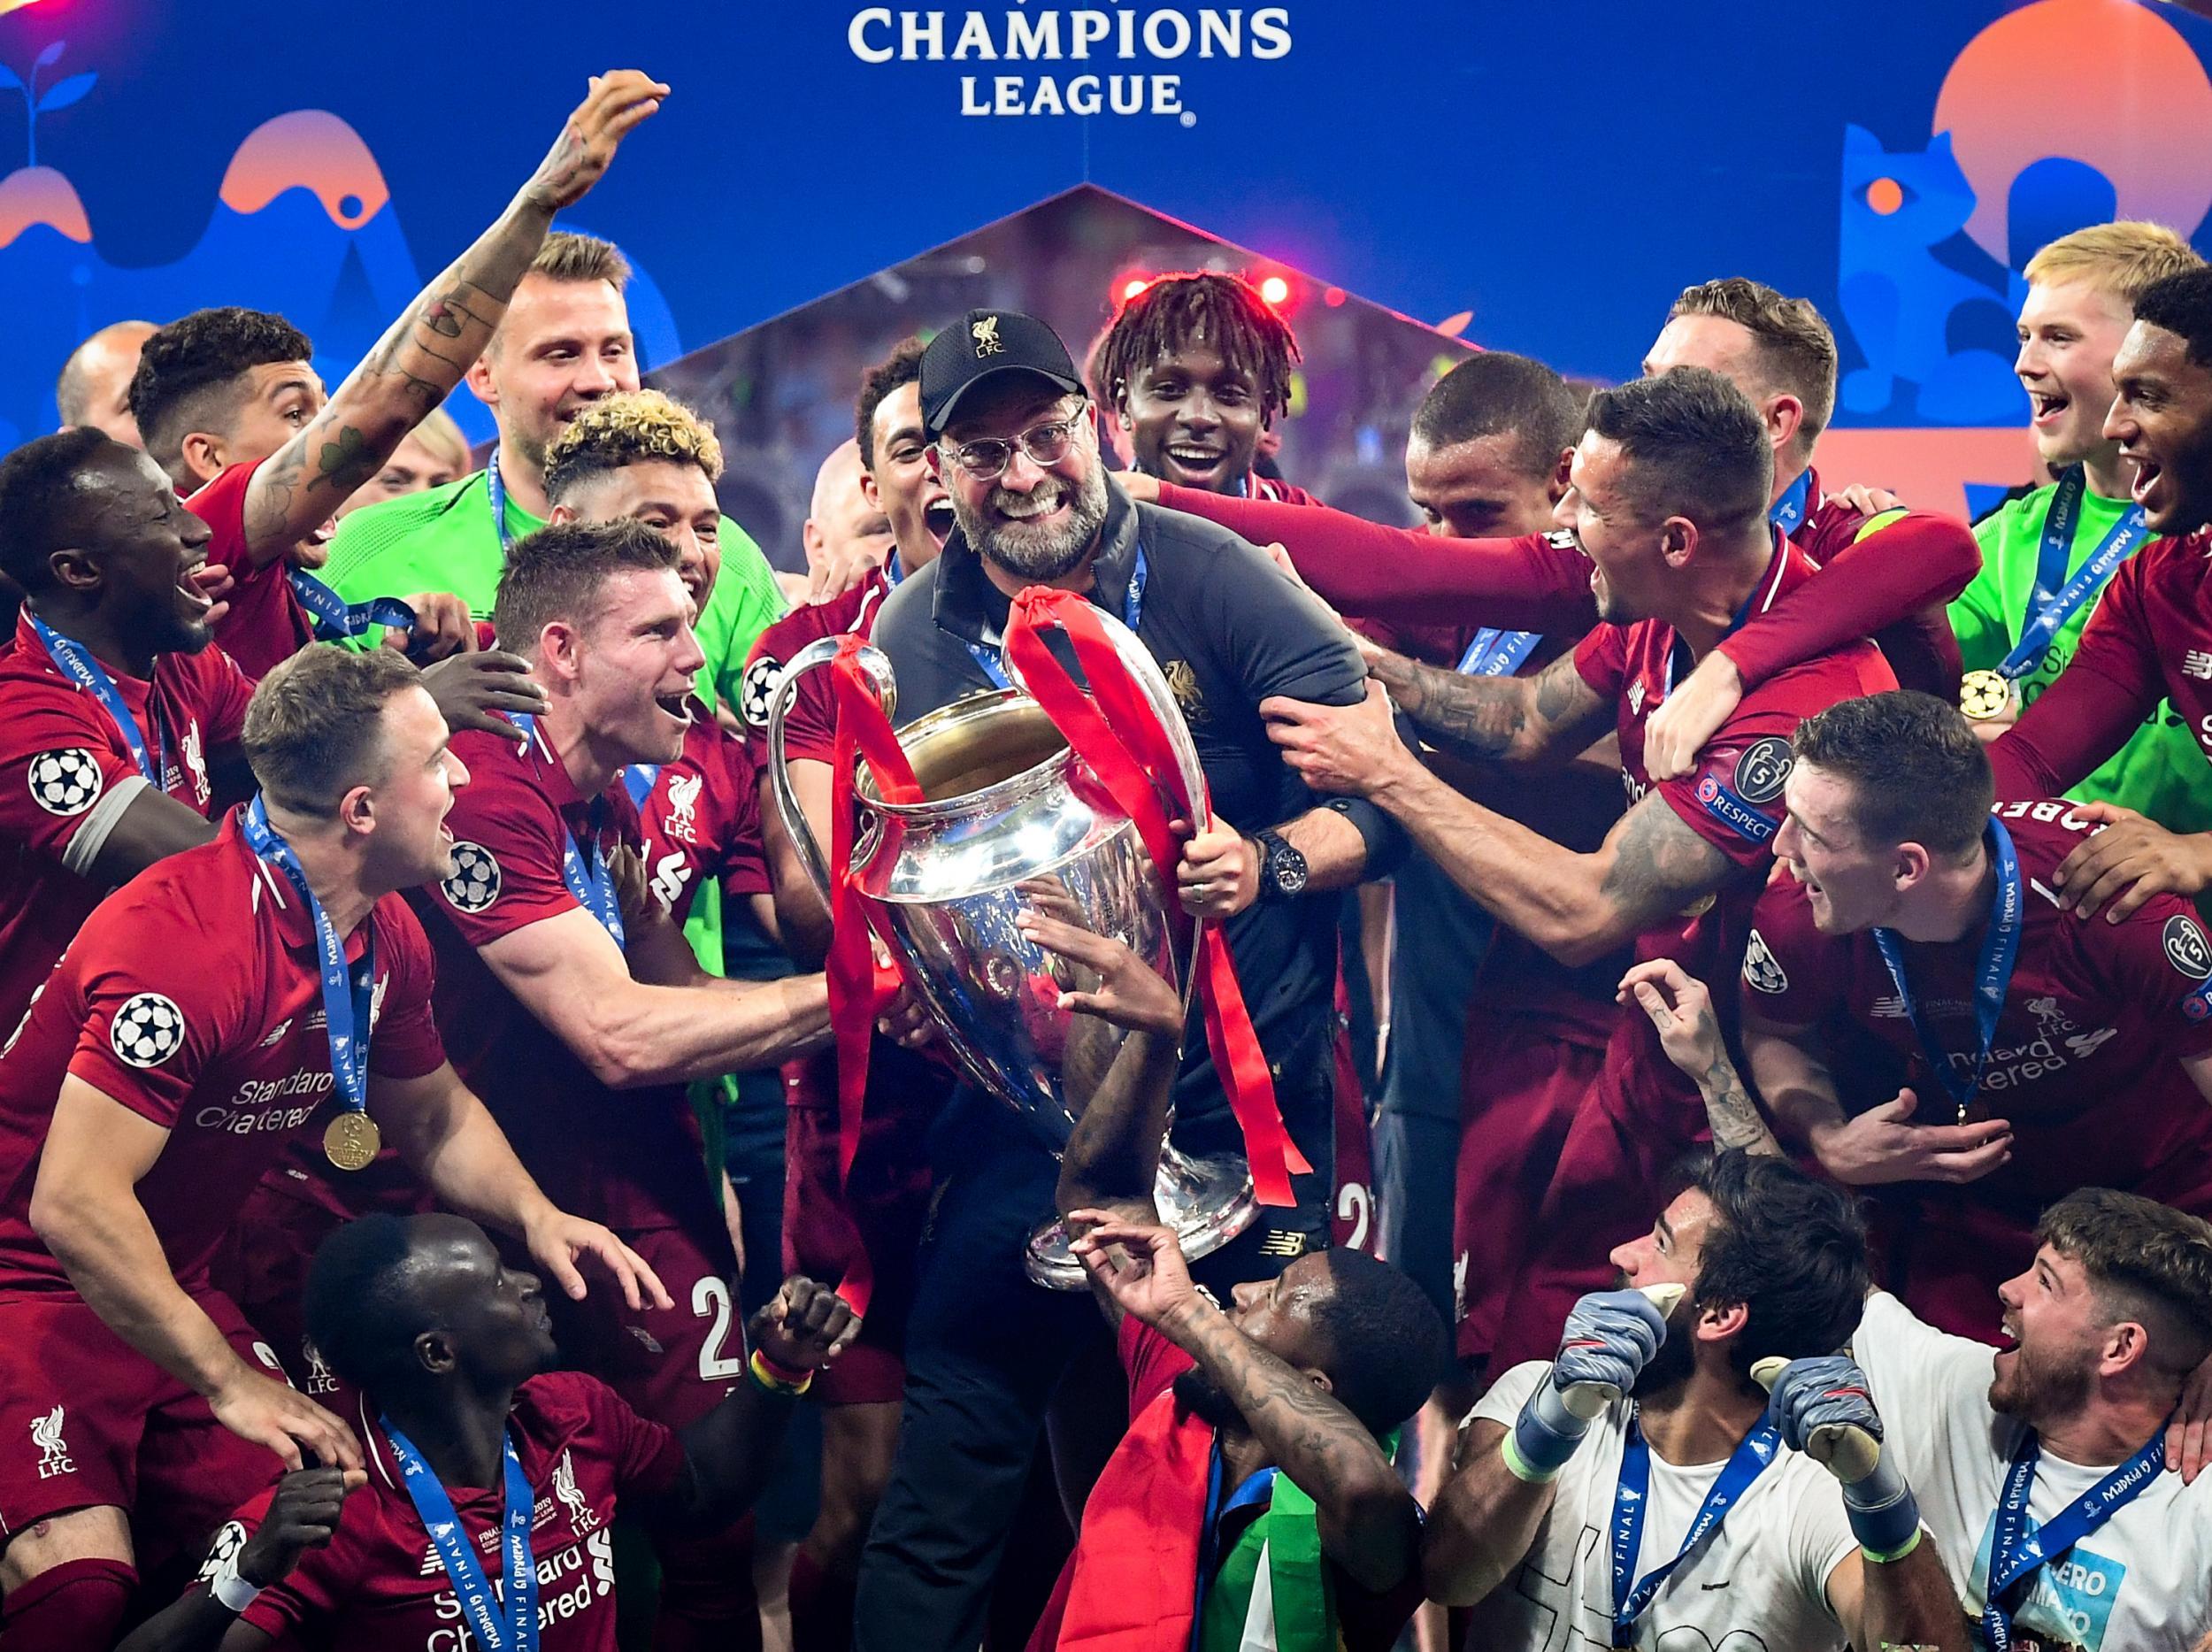 liverpool champions league 2019